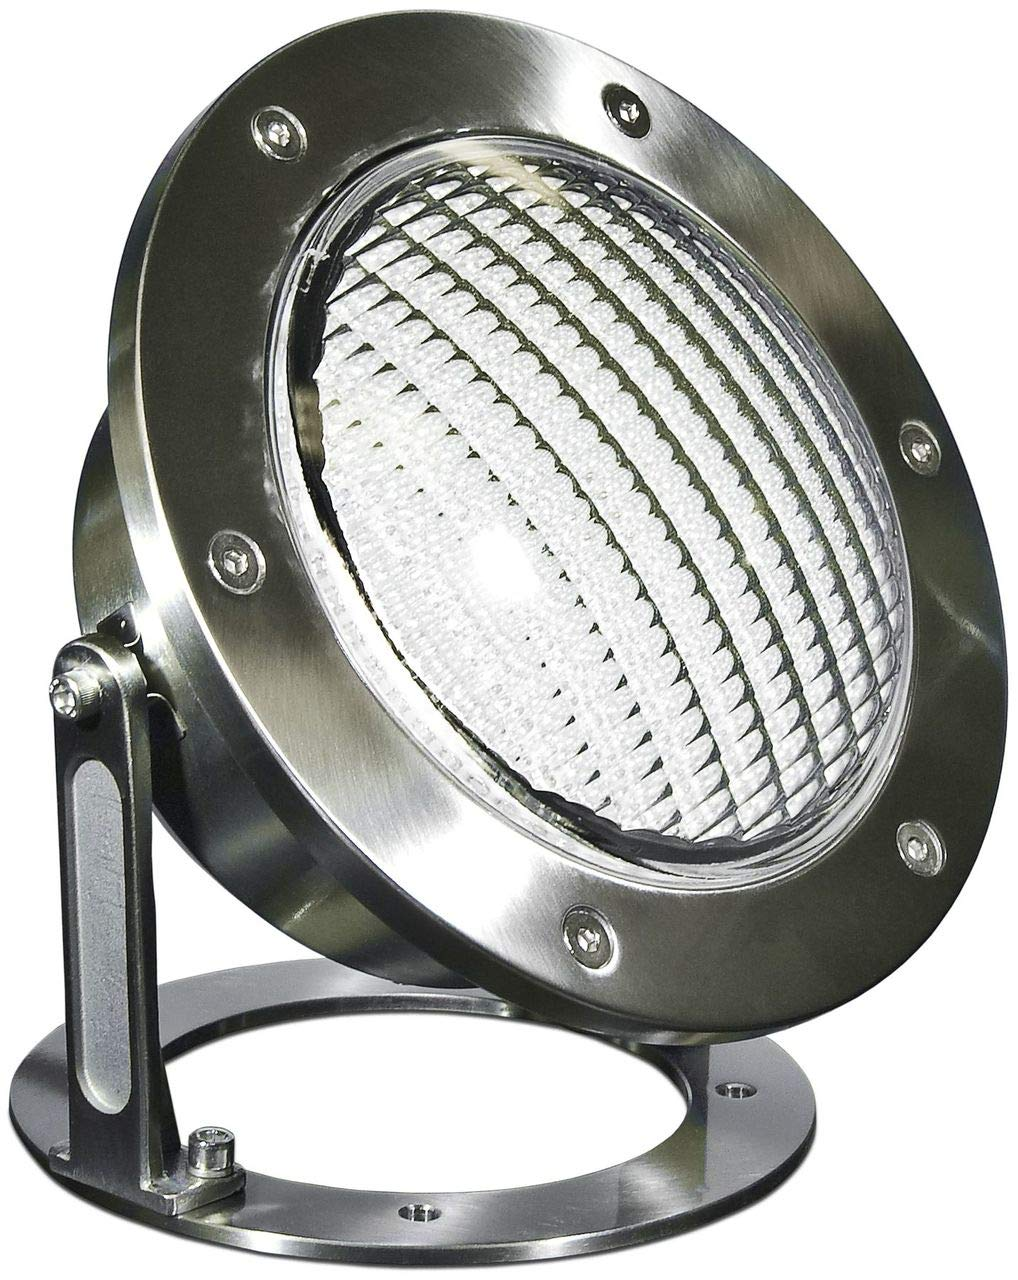 DABMAR LIGHTING LV302-SS316 316 Marine Grade Stainless Steel Pond/Fountain Underwater Light, 316 Marine Grade Stainless Steel